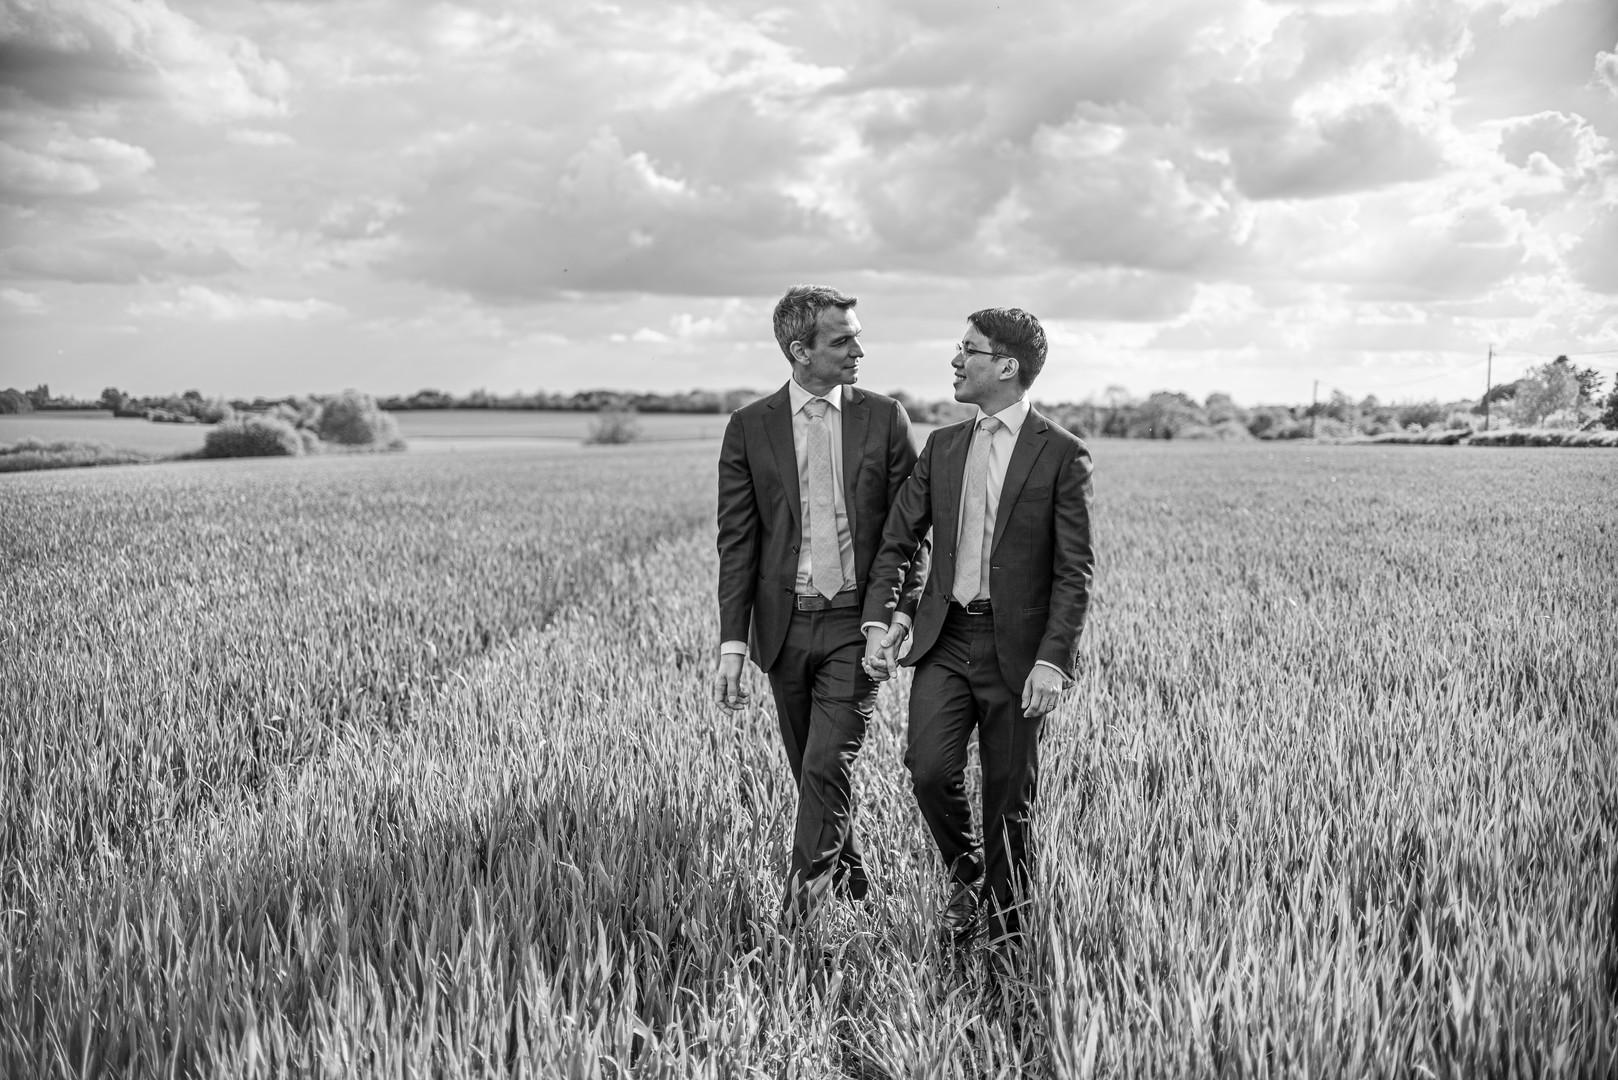 gay wedding photo in field